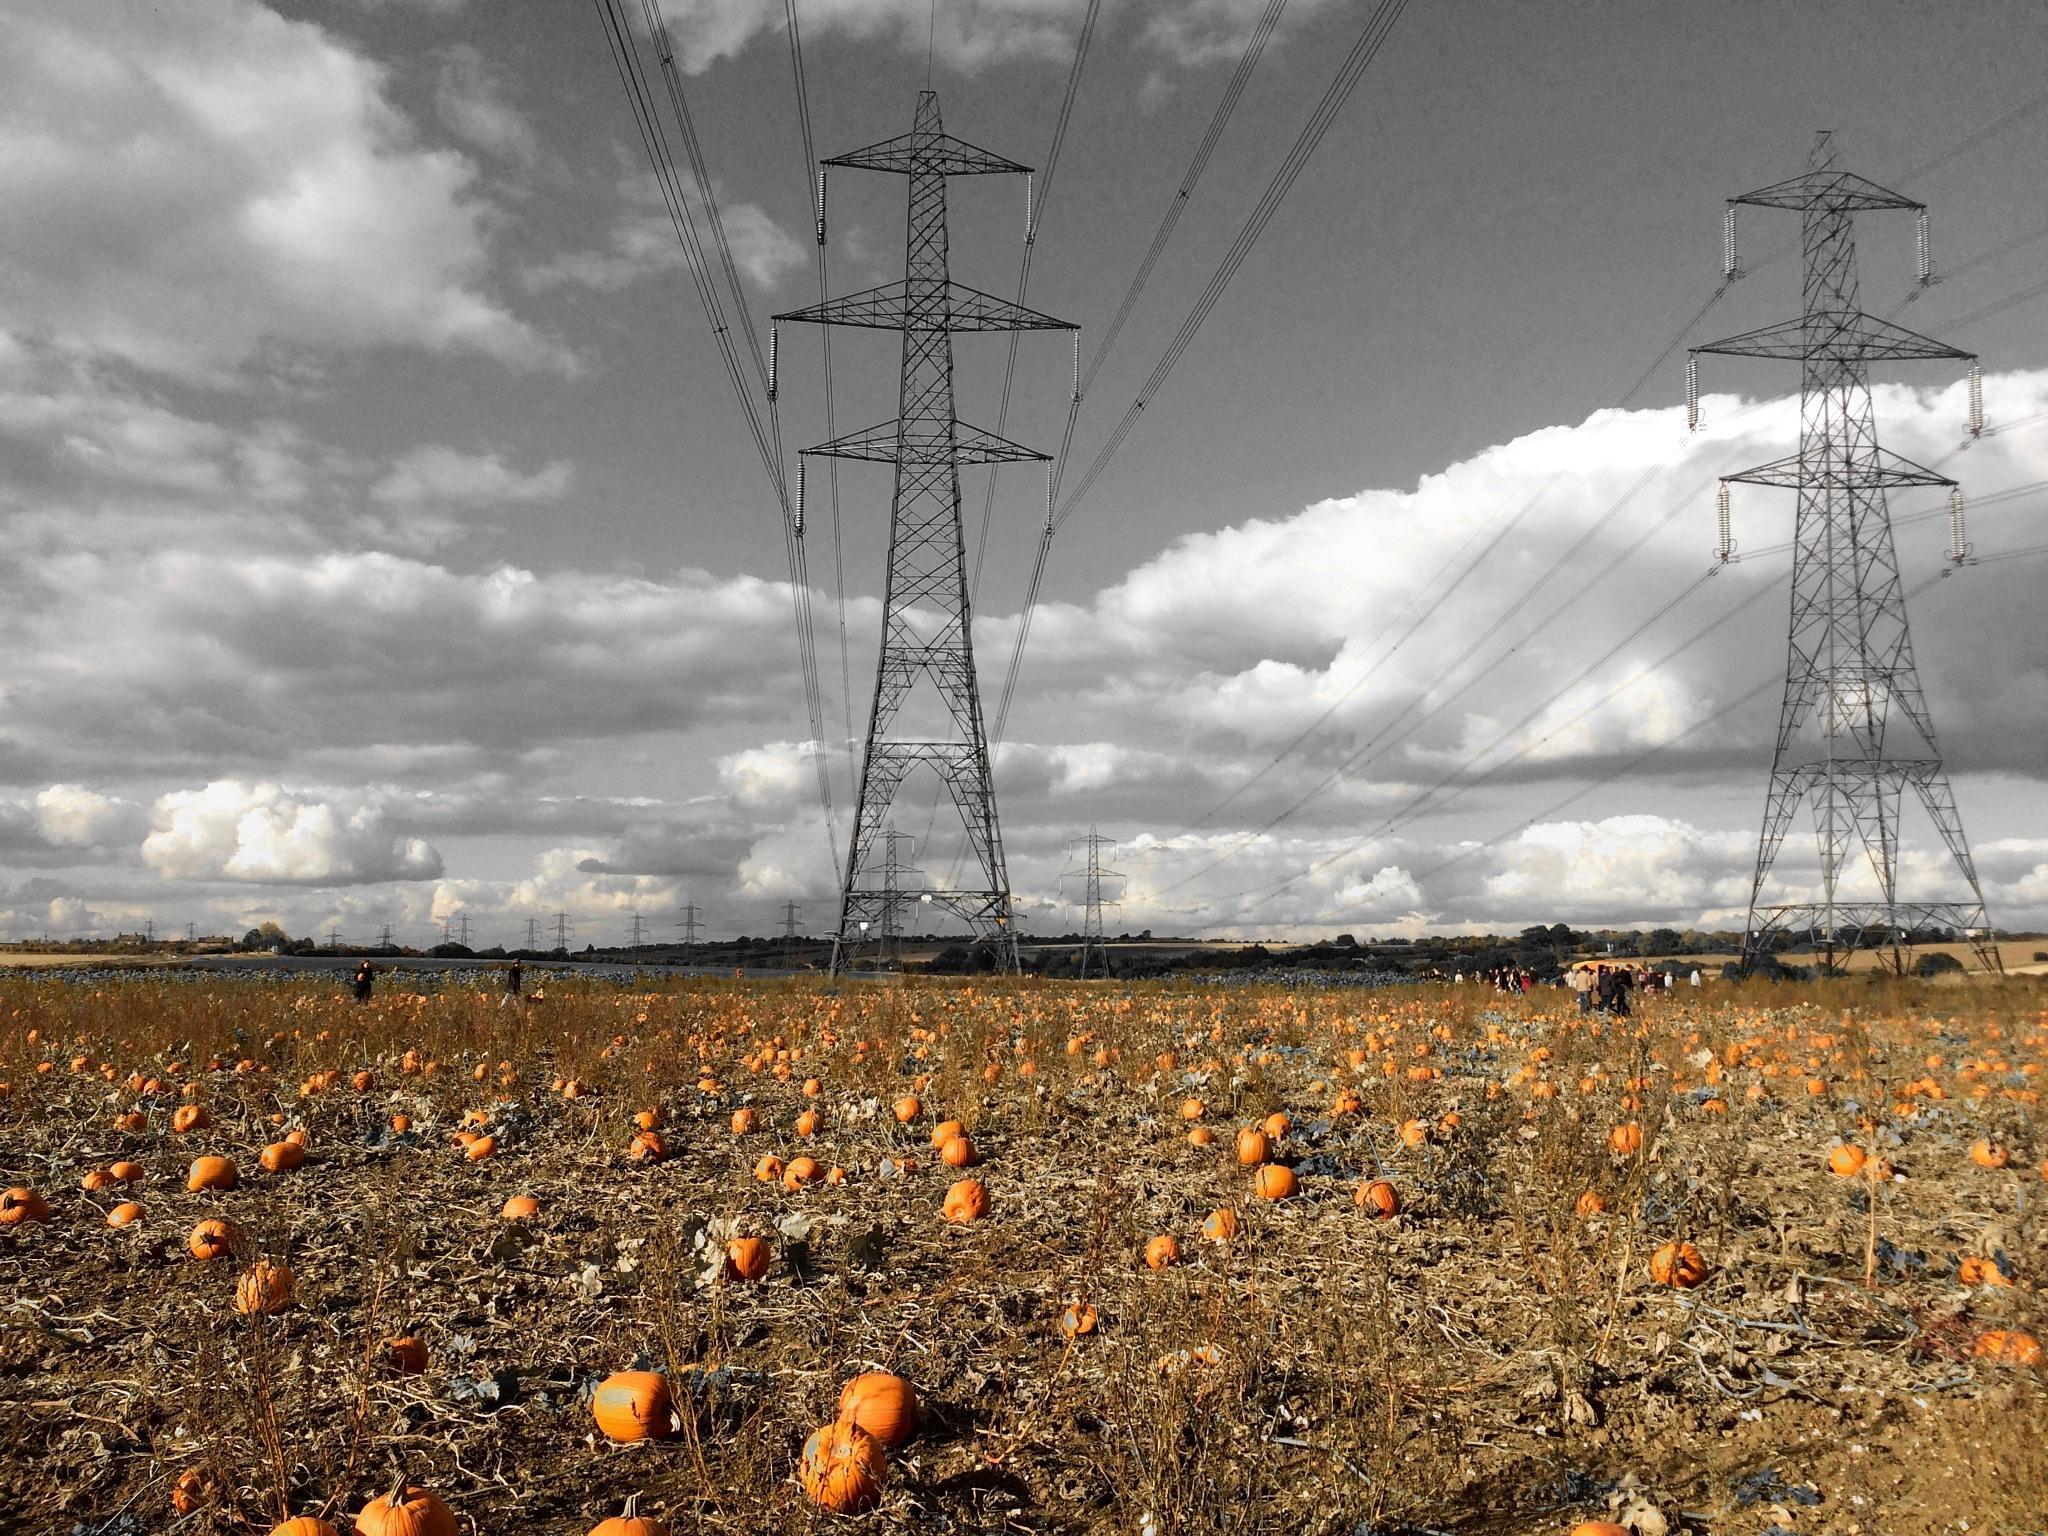 Pylons and Pumpkins by PaulWhiteman